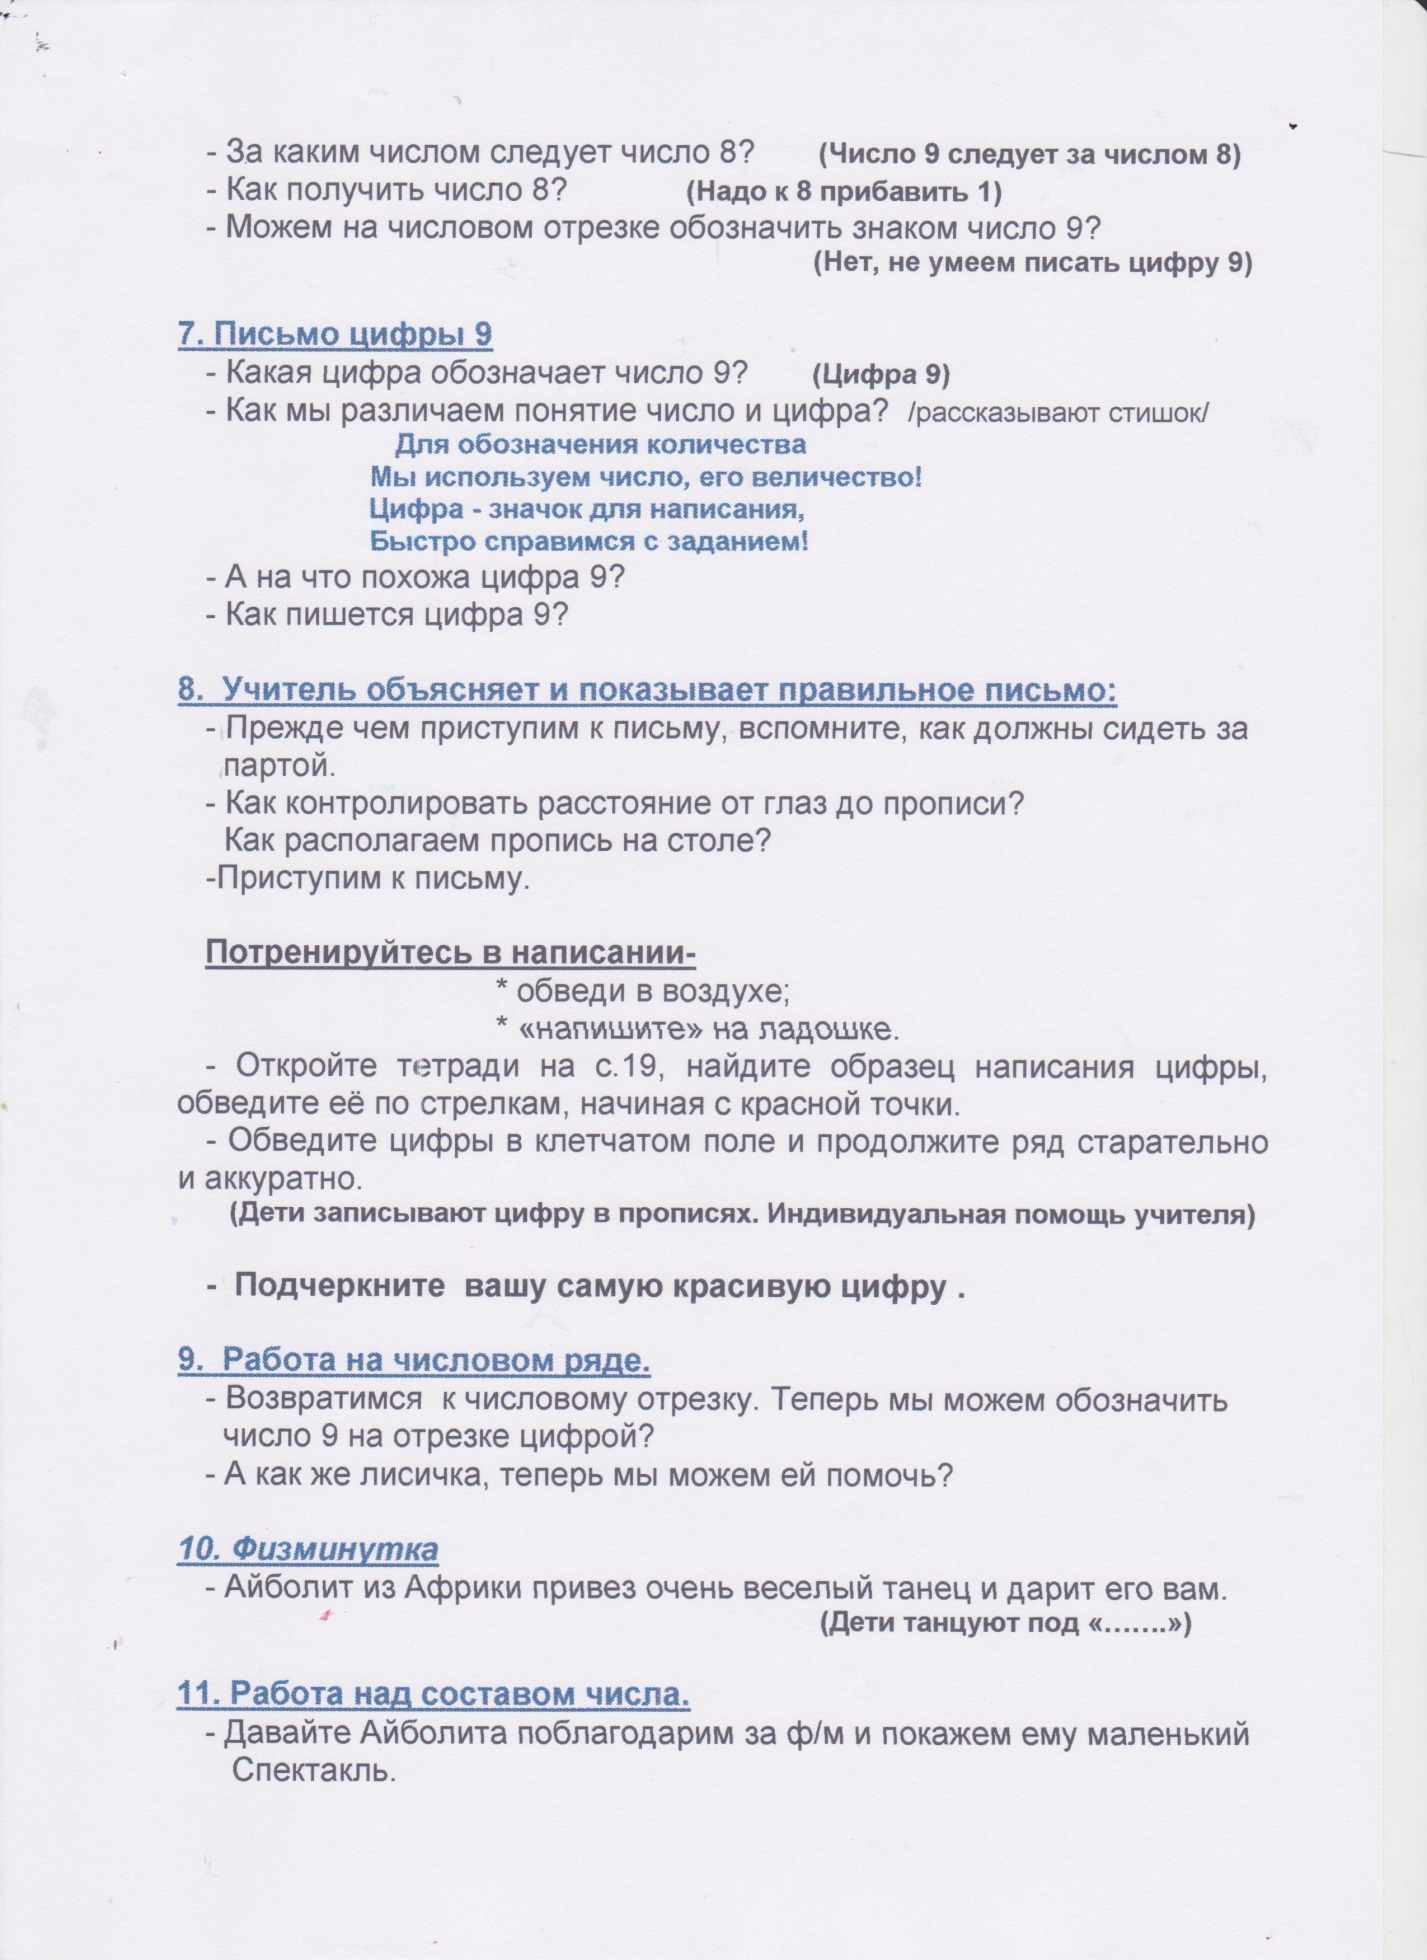 C:\Users\Acer\Desktop\7777777777\урок число 9\4 001.jpg